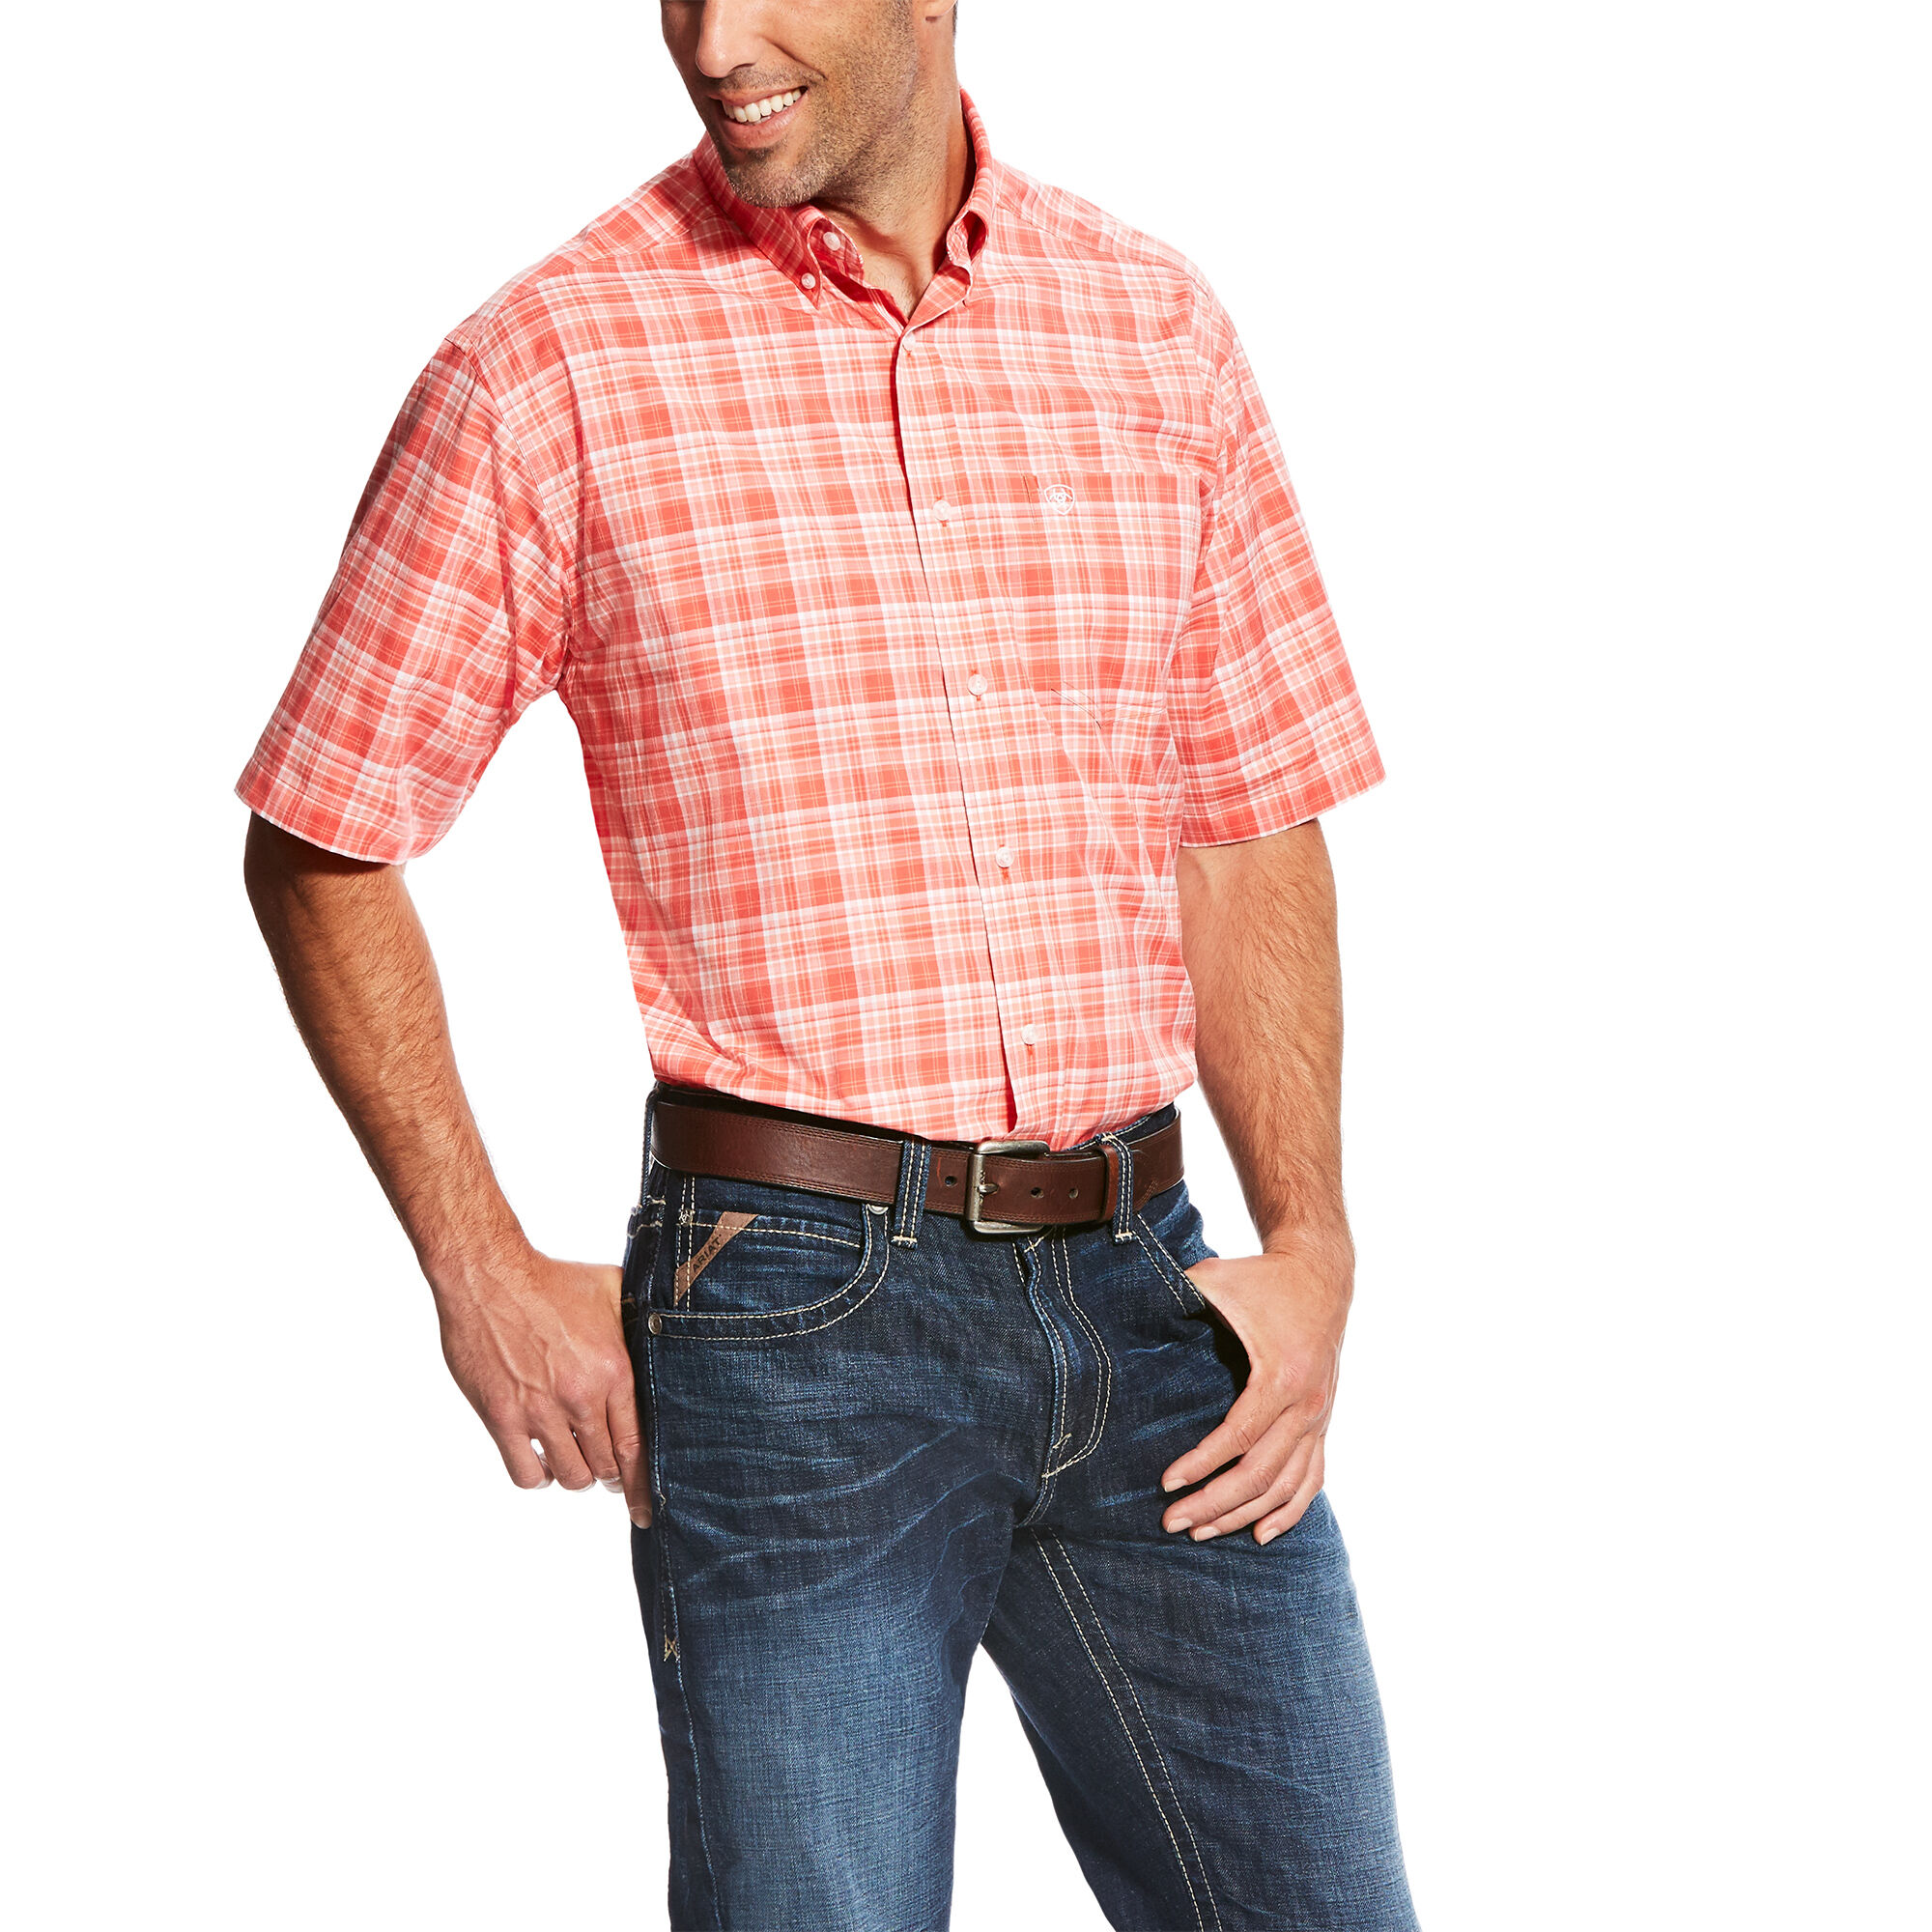 Pro Series Narcisso Shirt